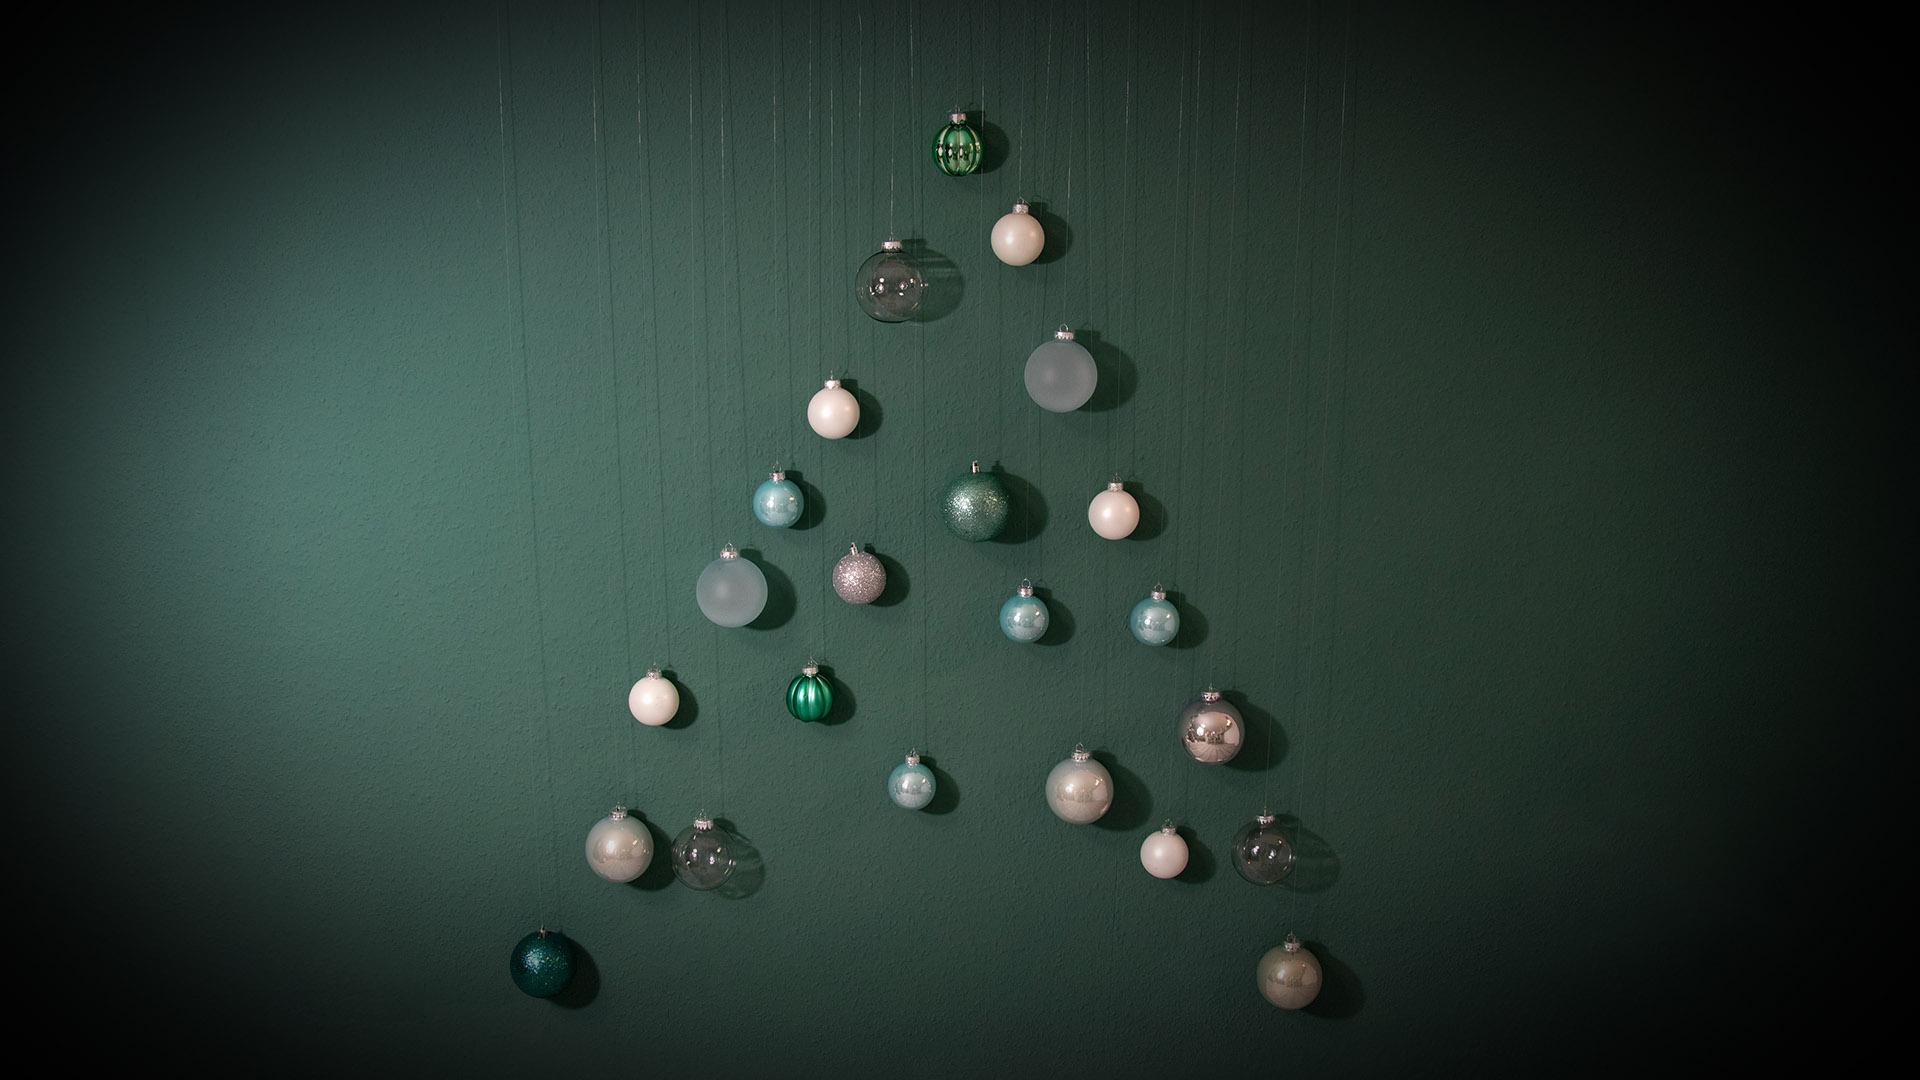 letters-and-beads-diy-alternative-tannenbaum-holz-christbaumkugeln-header